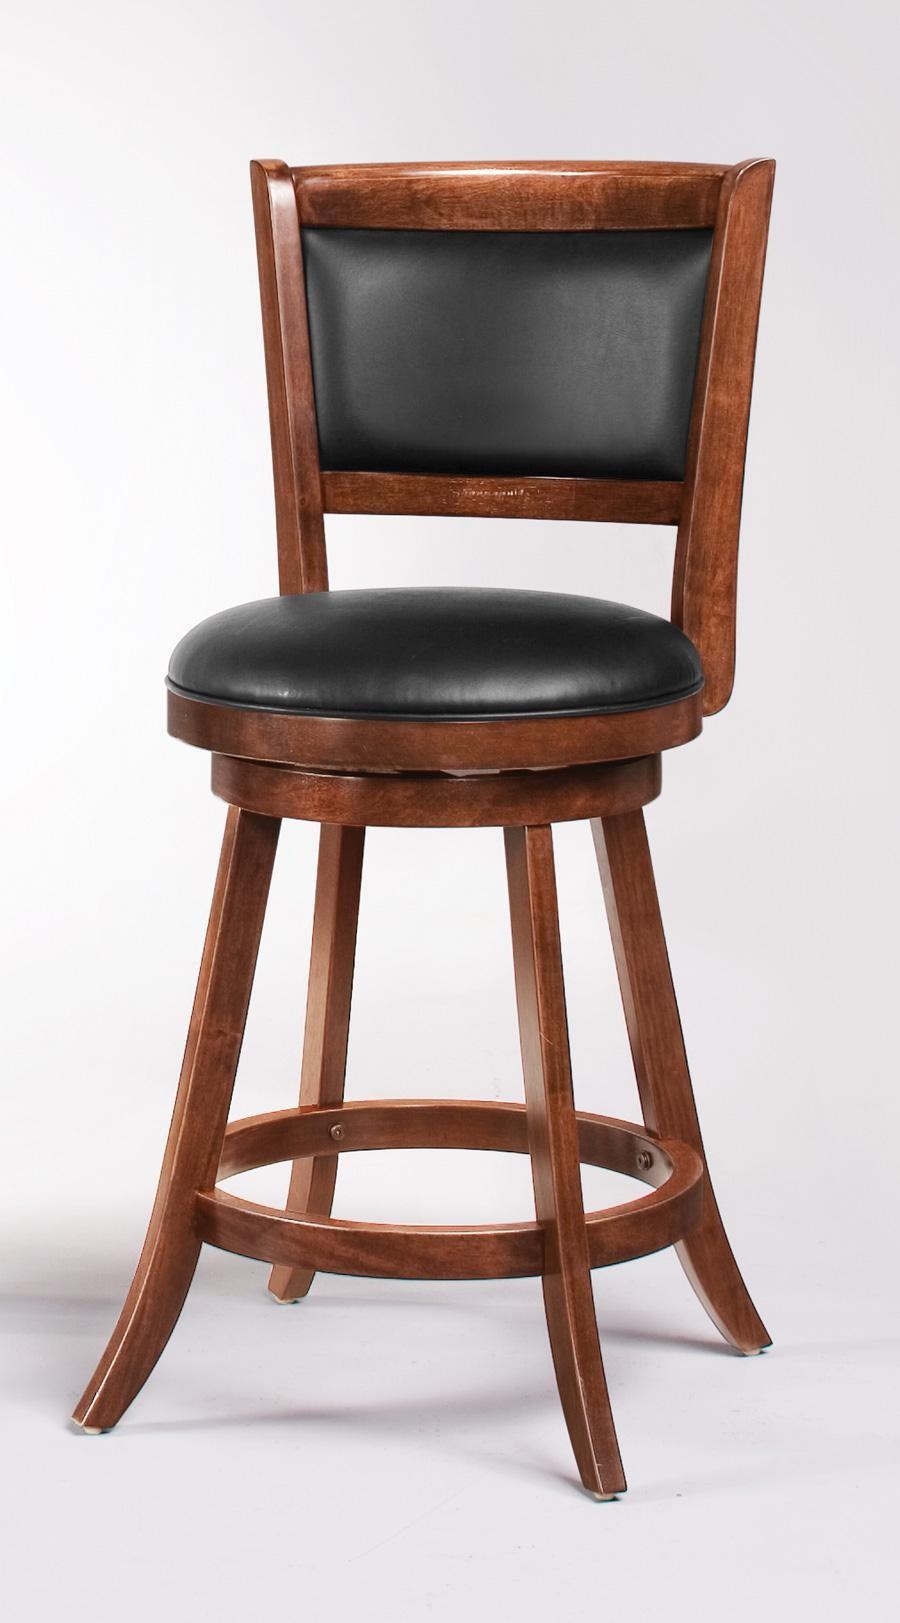 Espresso 24 Quot Swivel Bar Stool 101919 Set Of 2 From Coaster